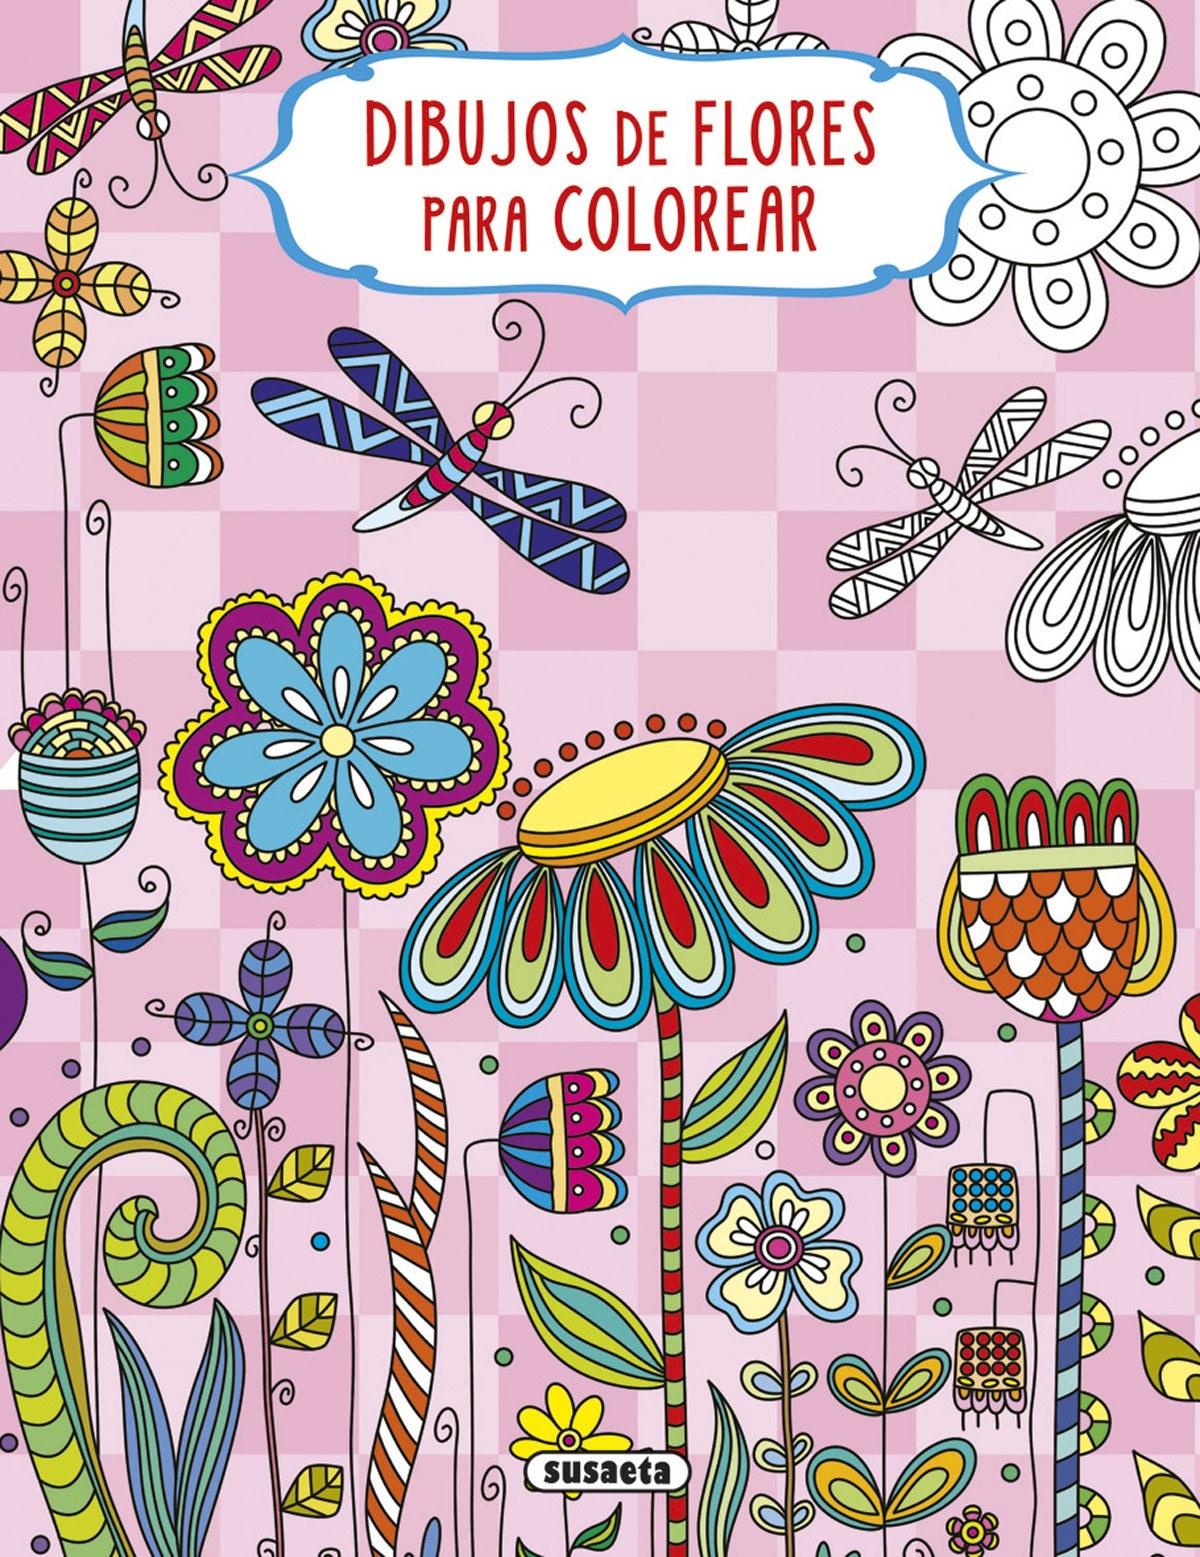 Dibujos de flores para colorear 9788467750089